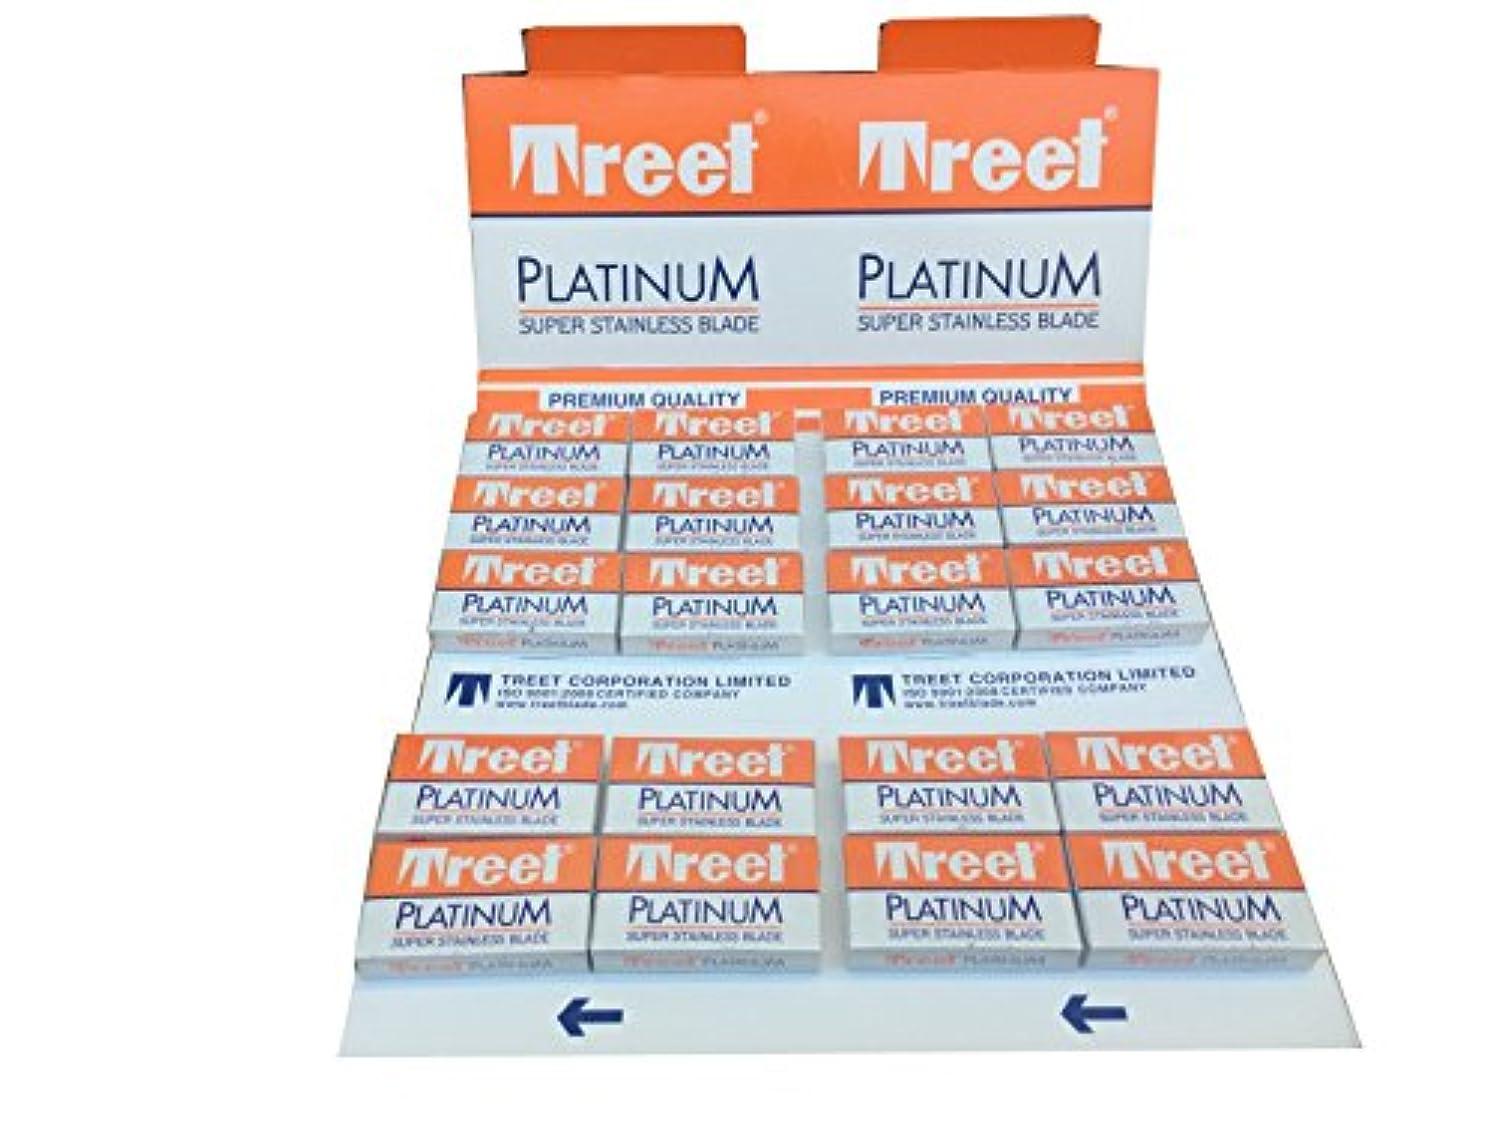 Treet Platinum 両刃替刃 200枚入り(10枚入り20 個セット)【並行輸入品】